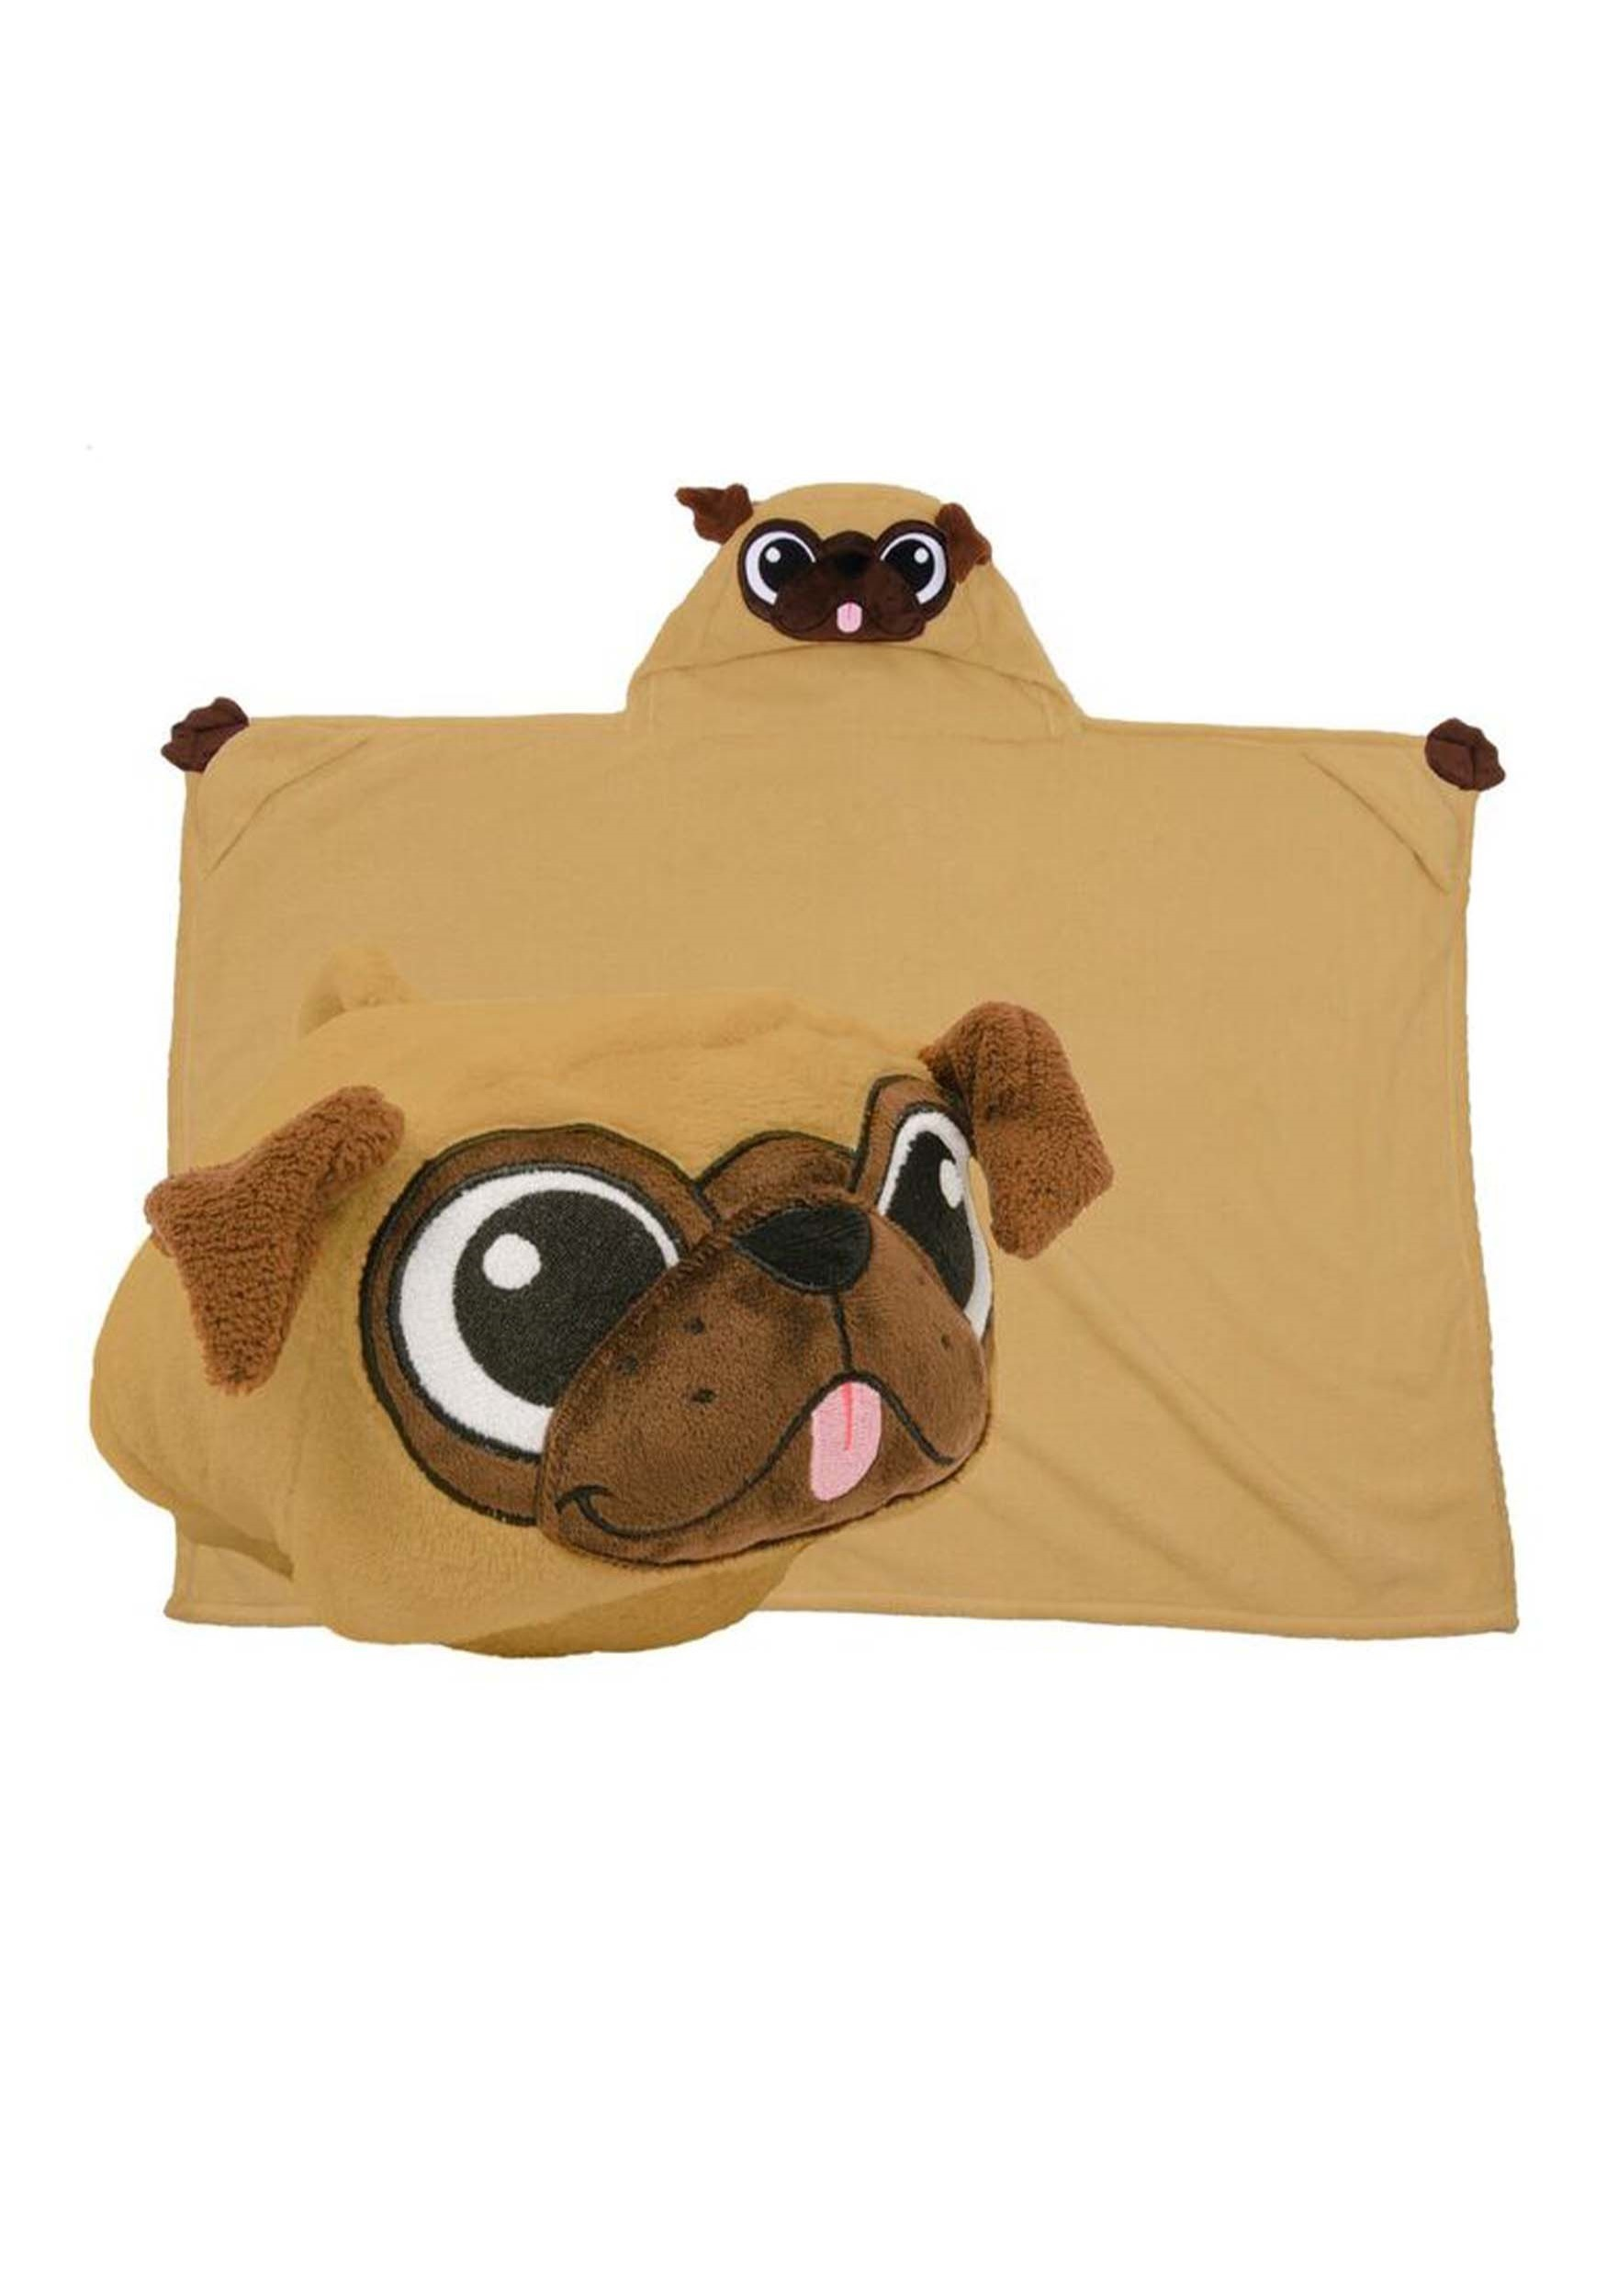 Pickle the Pug Comfy Critter Costume Blanket